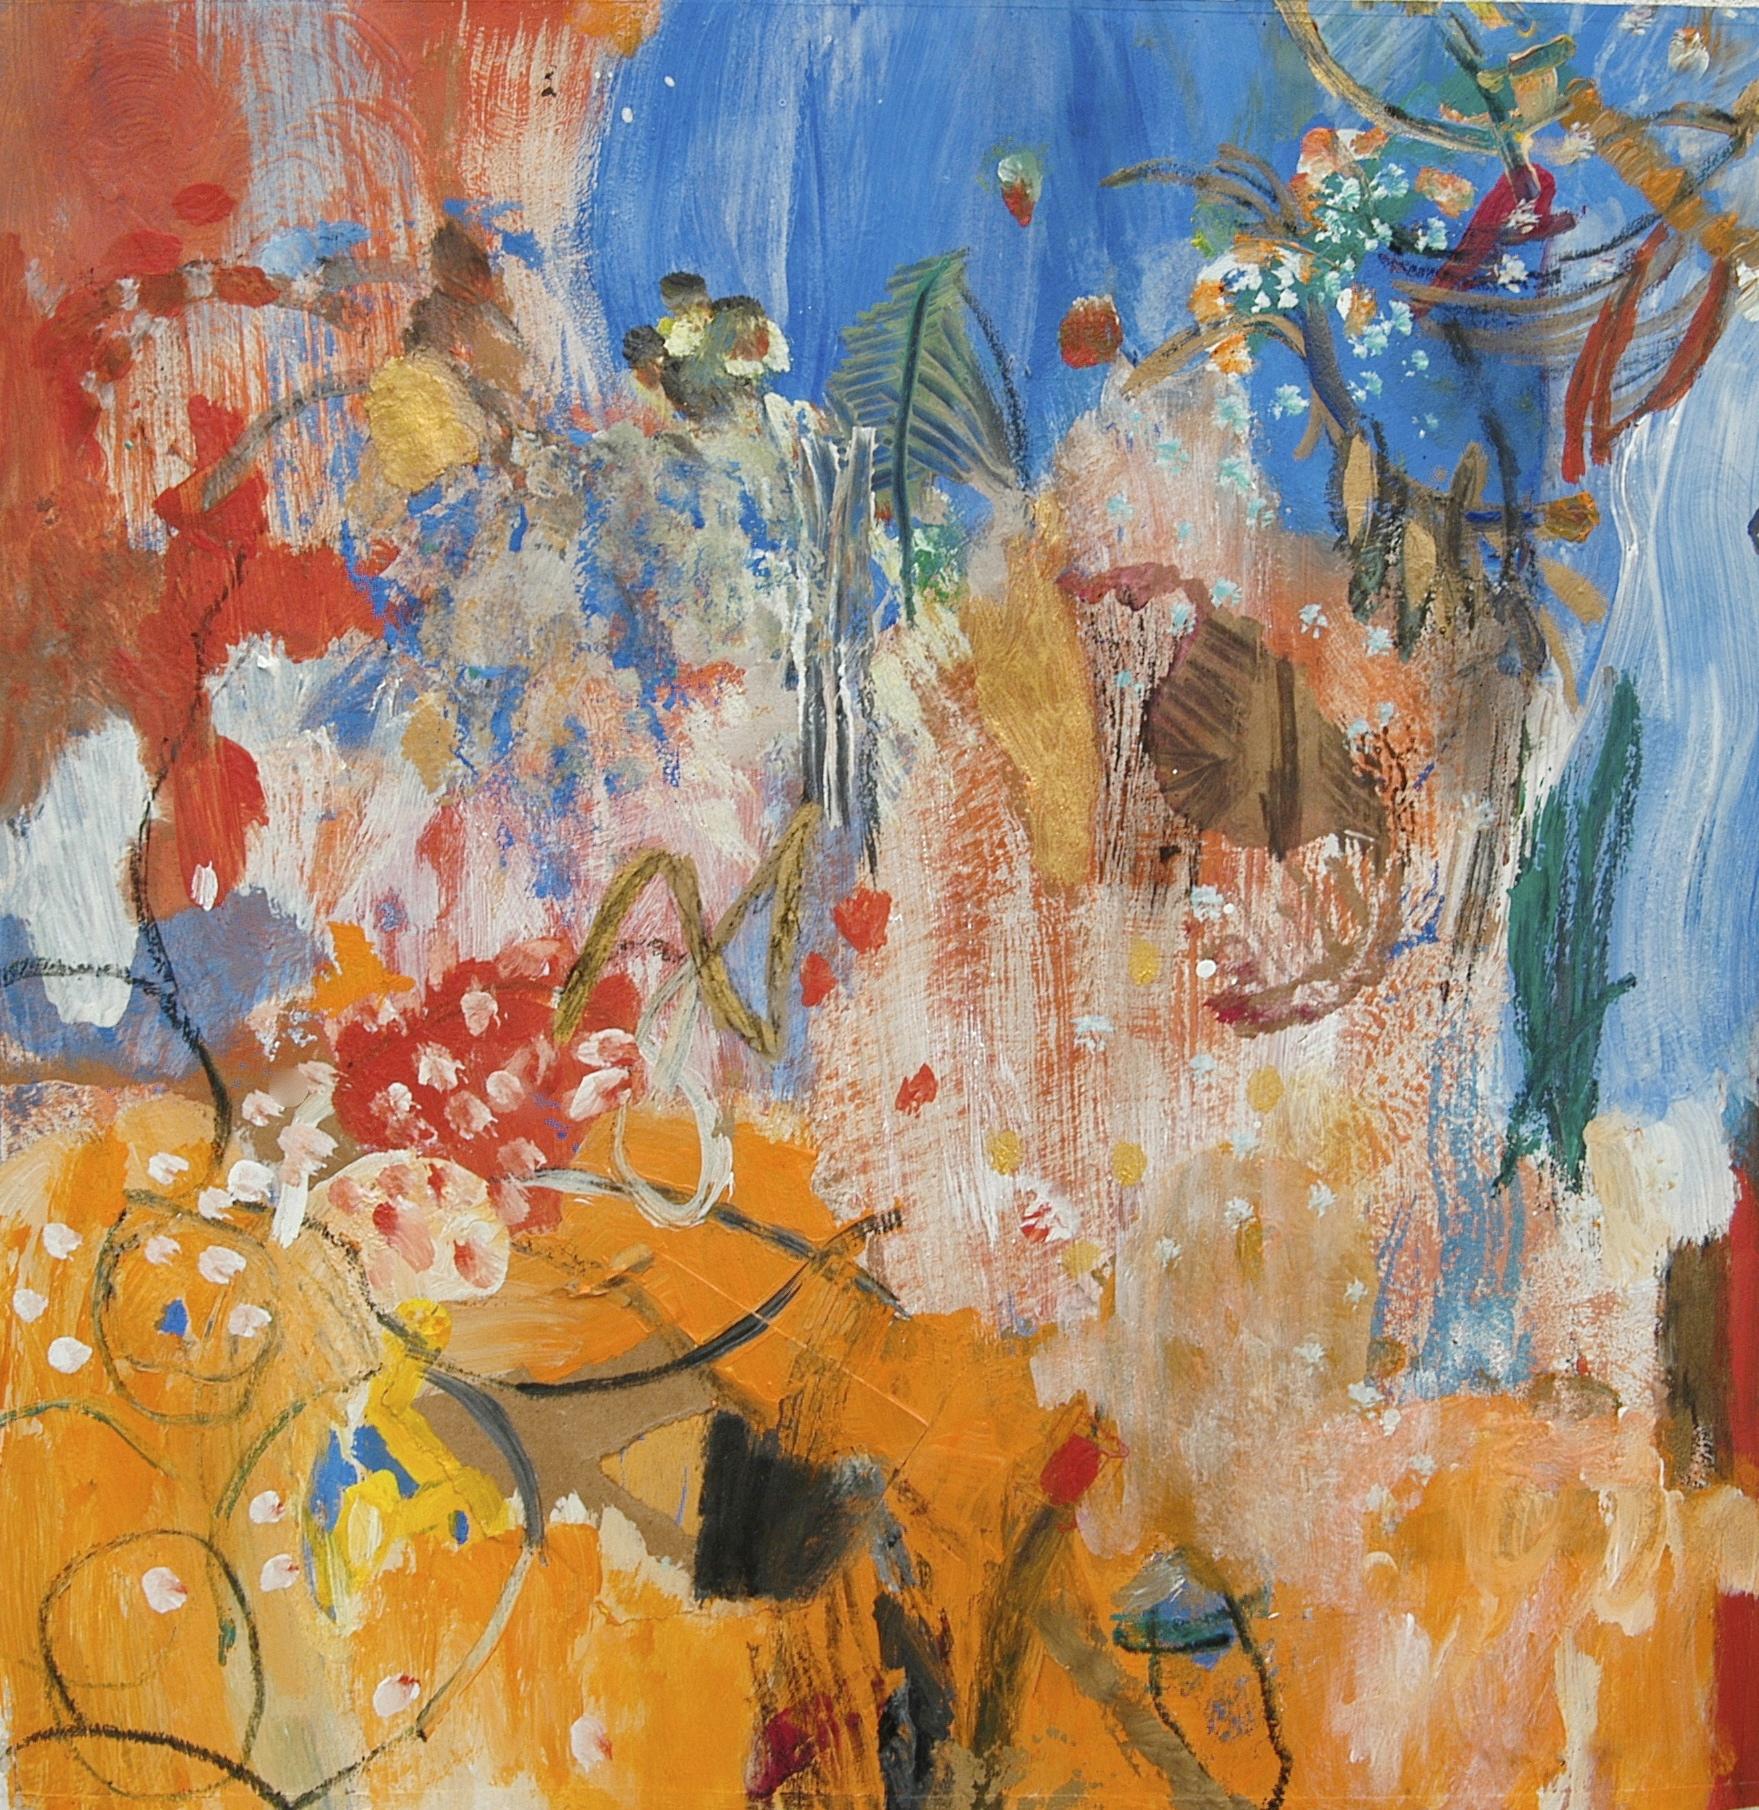 Terra Incognita -            Ellen McKay 2009 -  acrylic, collage, mixed media on paper 15%22x 15%22 .jpg